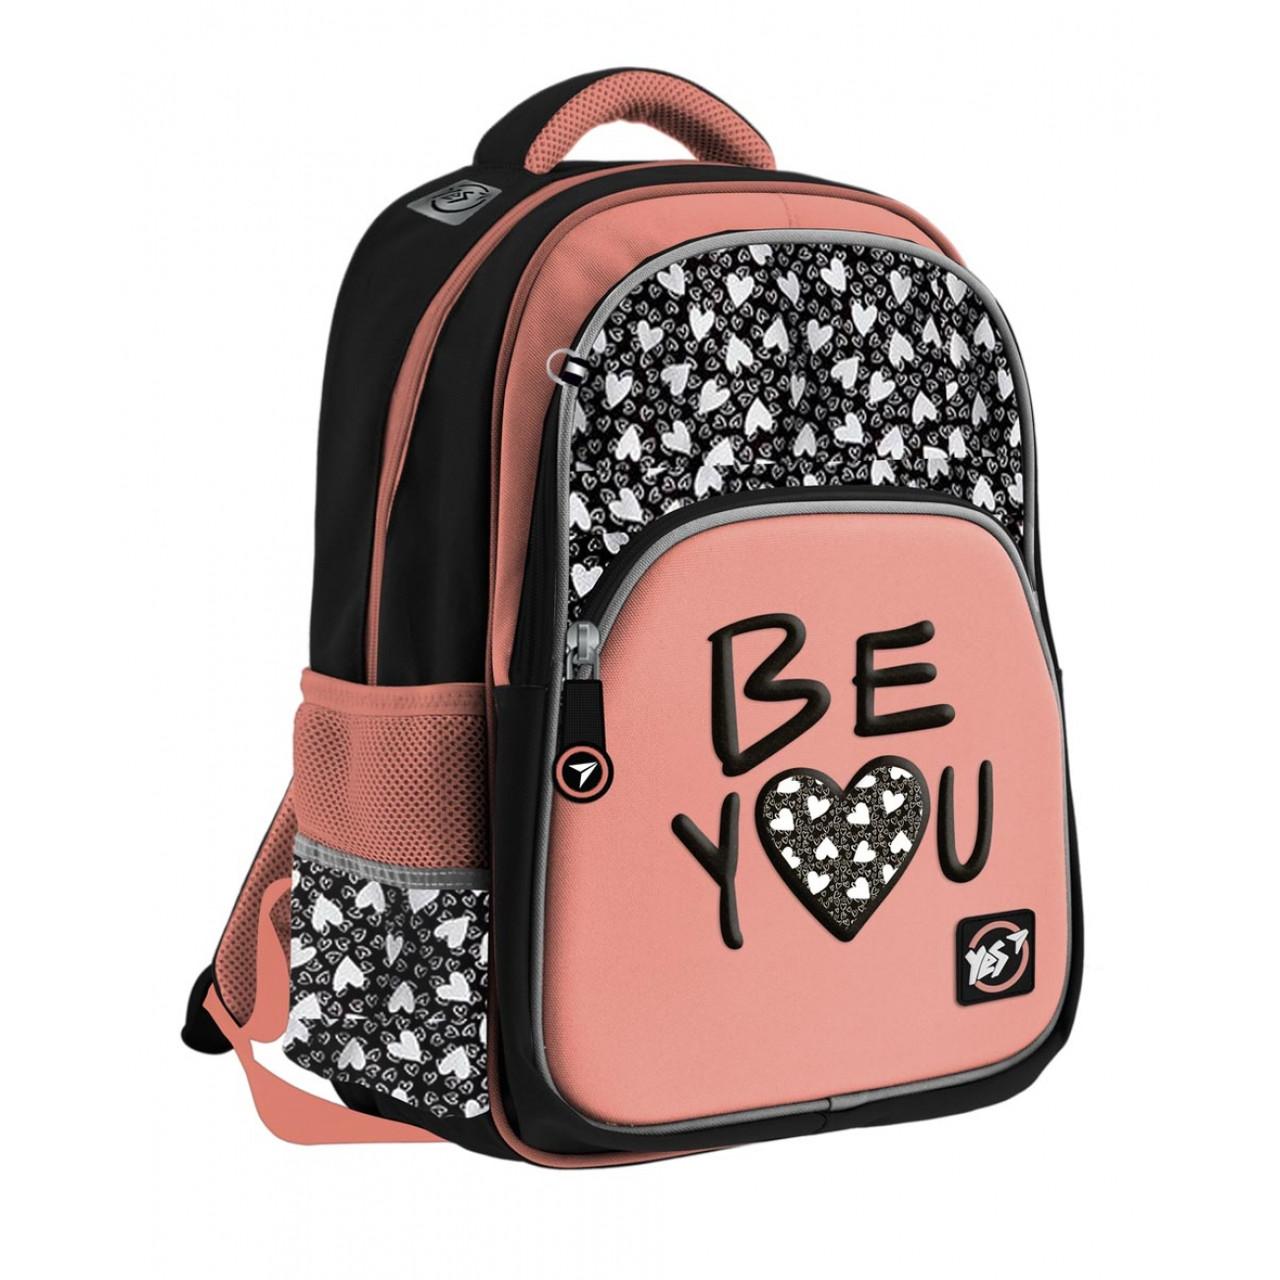 Рюкзак YES S-40h Be YOU Чорний/розовый (558553)